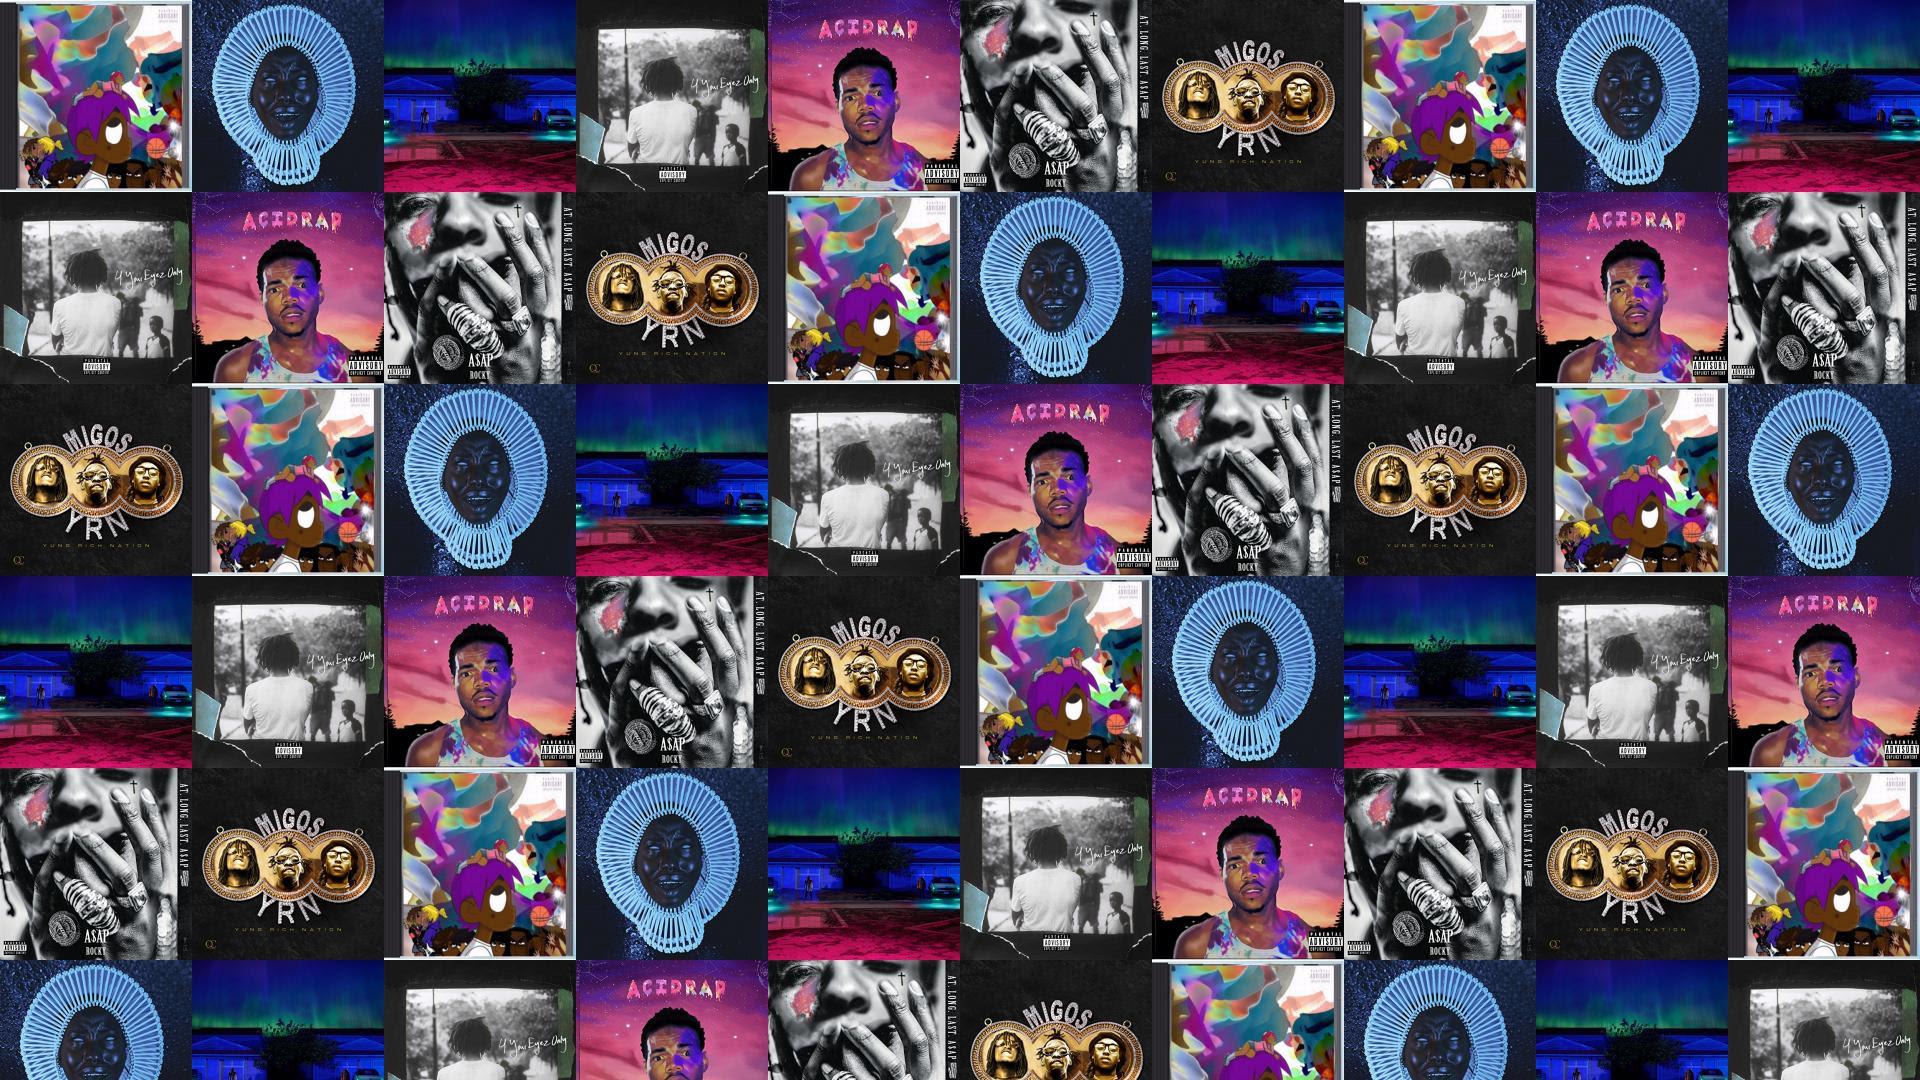 Lil Uzi Vert Childish Gambino Big Wallpaper Tiled Desktop Wallpaper